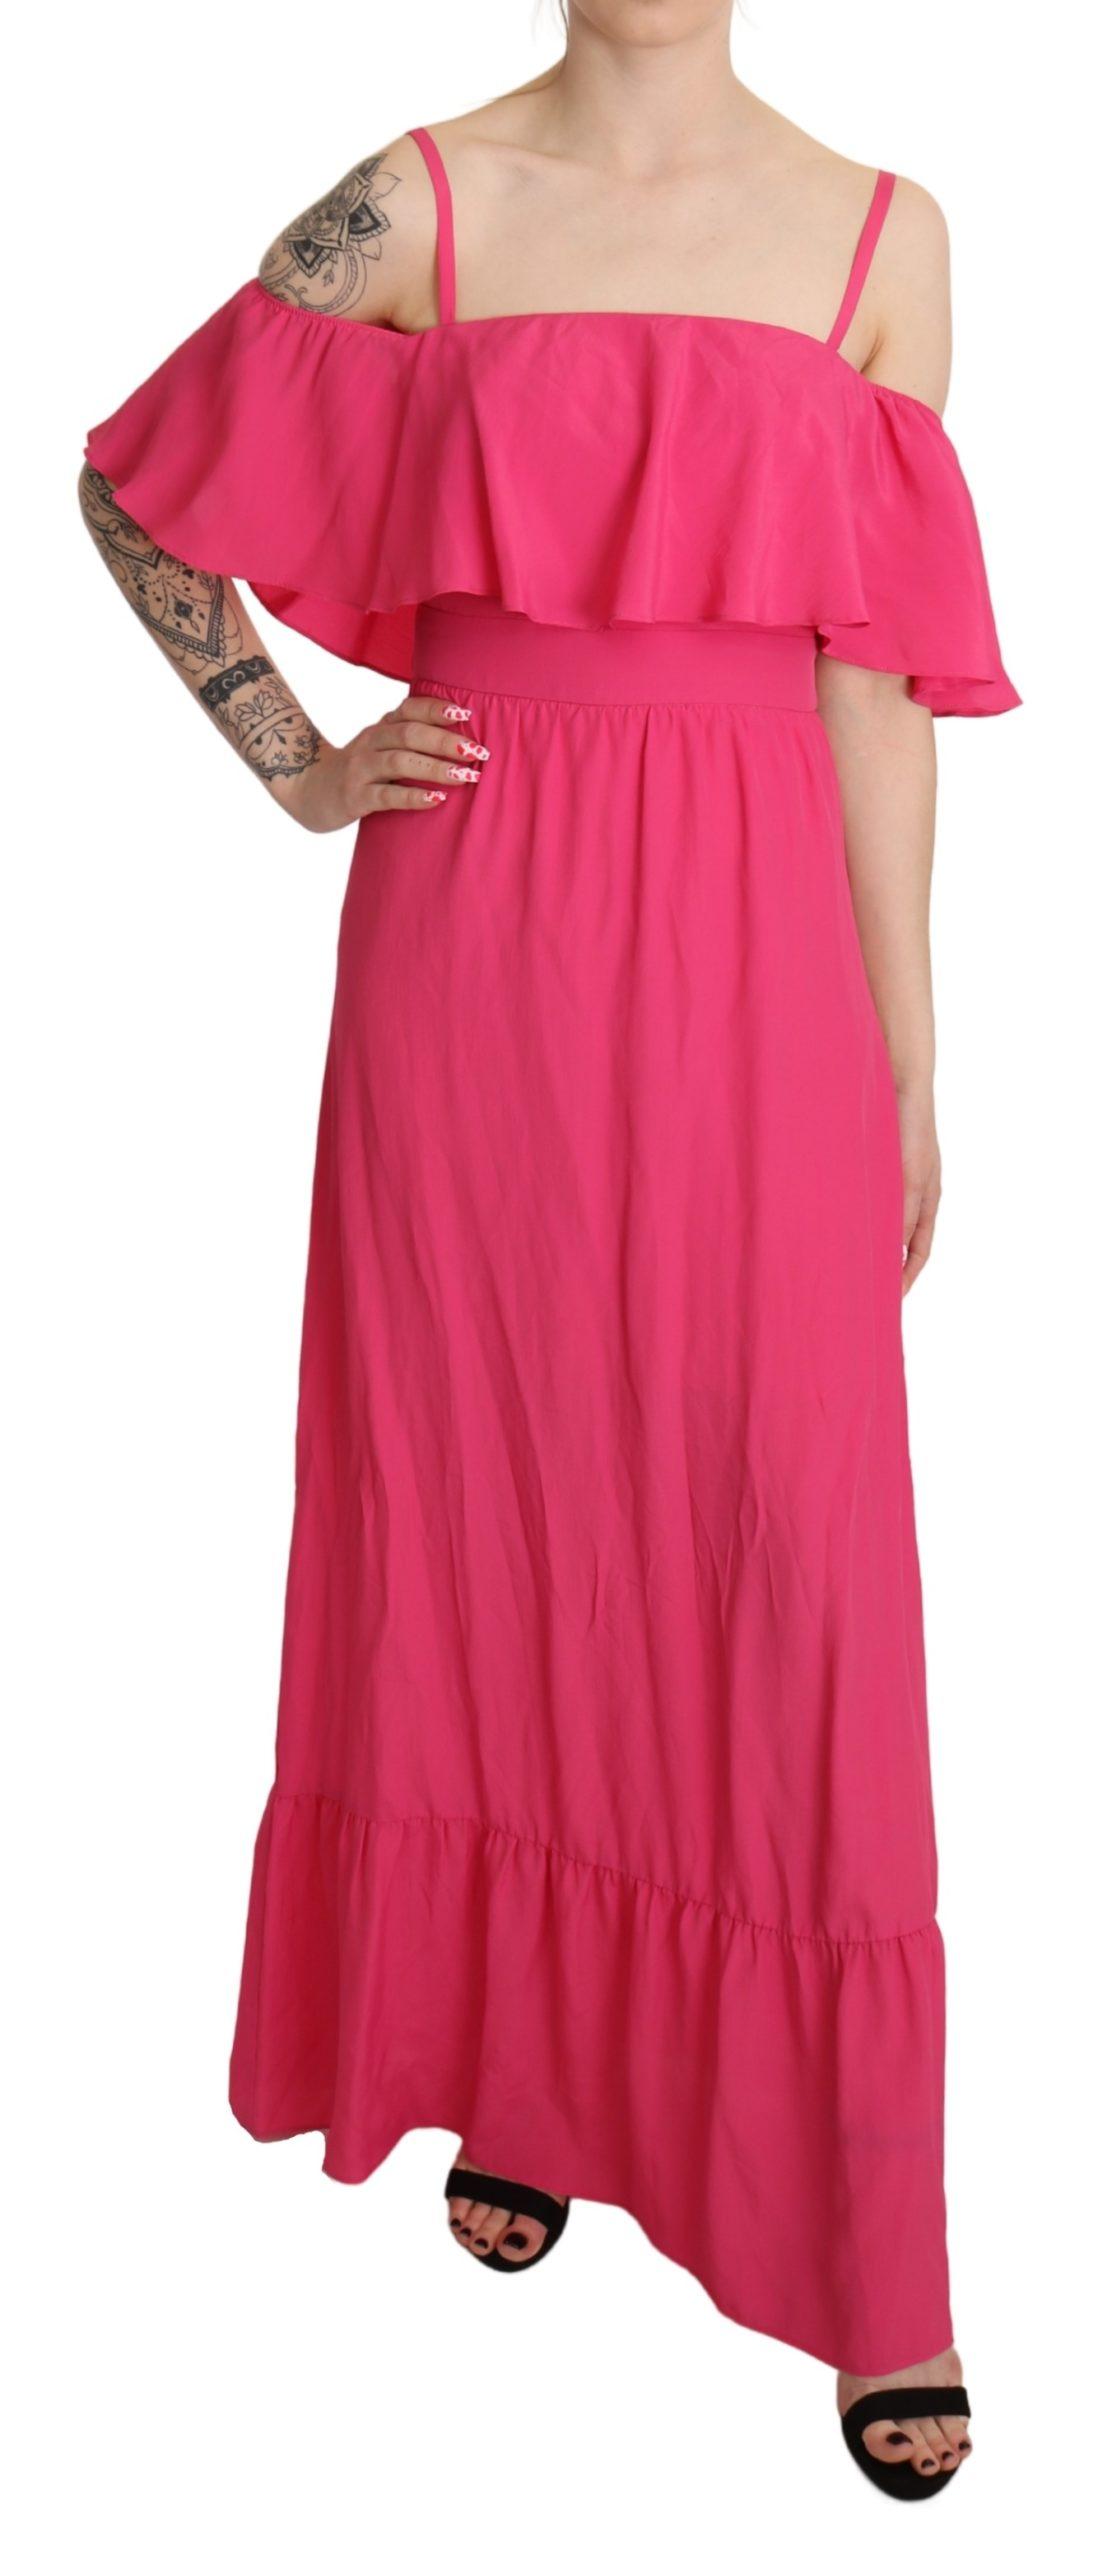 Liu Jo Women's A-line Off Shoulder Floor Length Dress Pink DR2614 - IT40|S